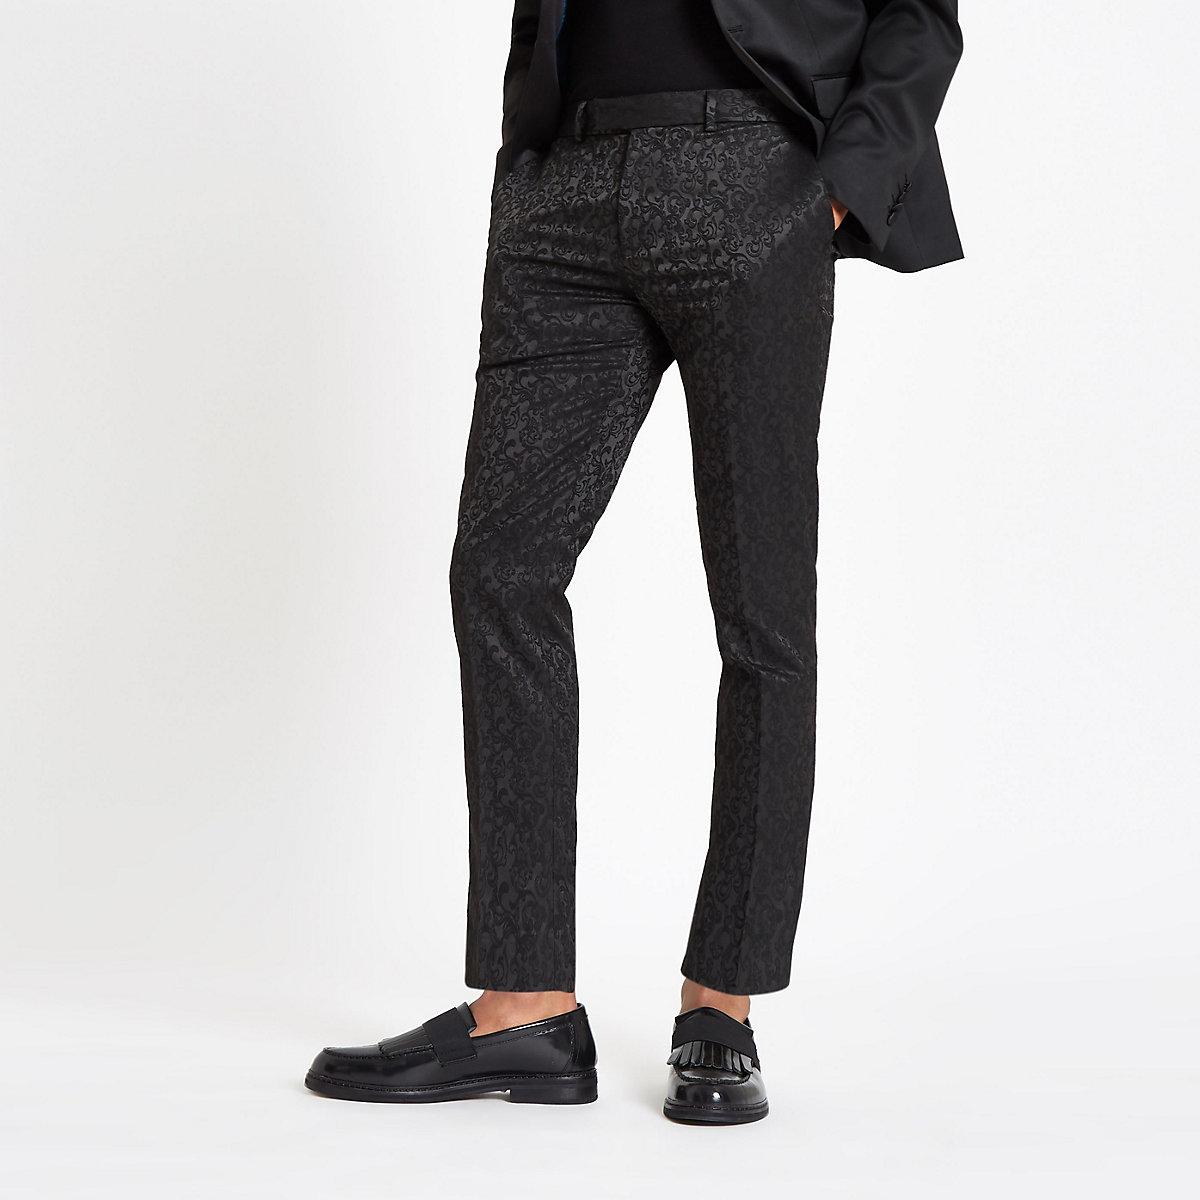 Black jacquard stretch skinny smart pants